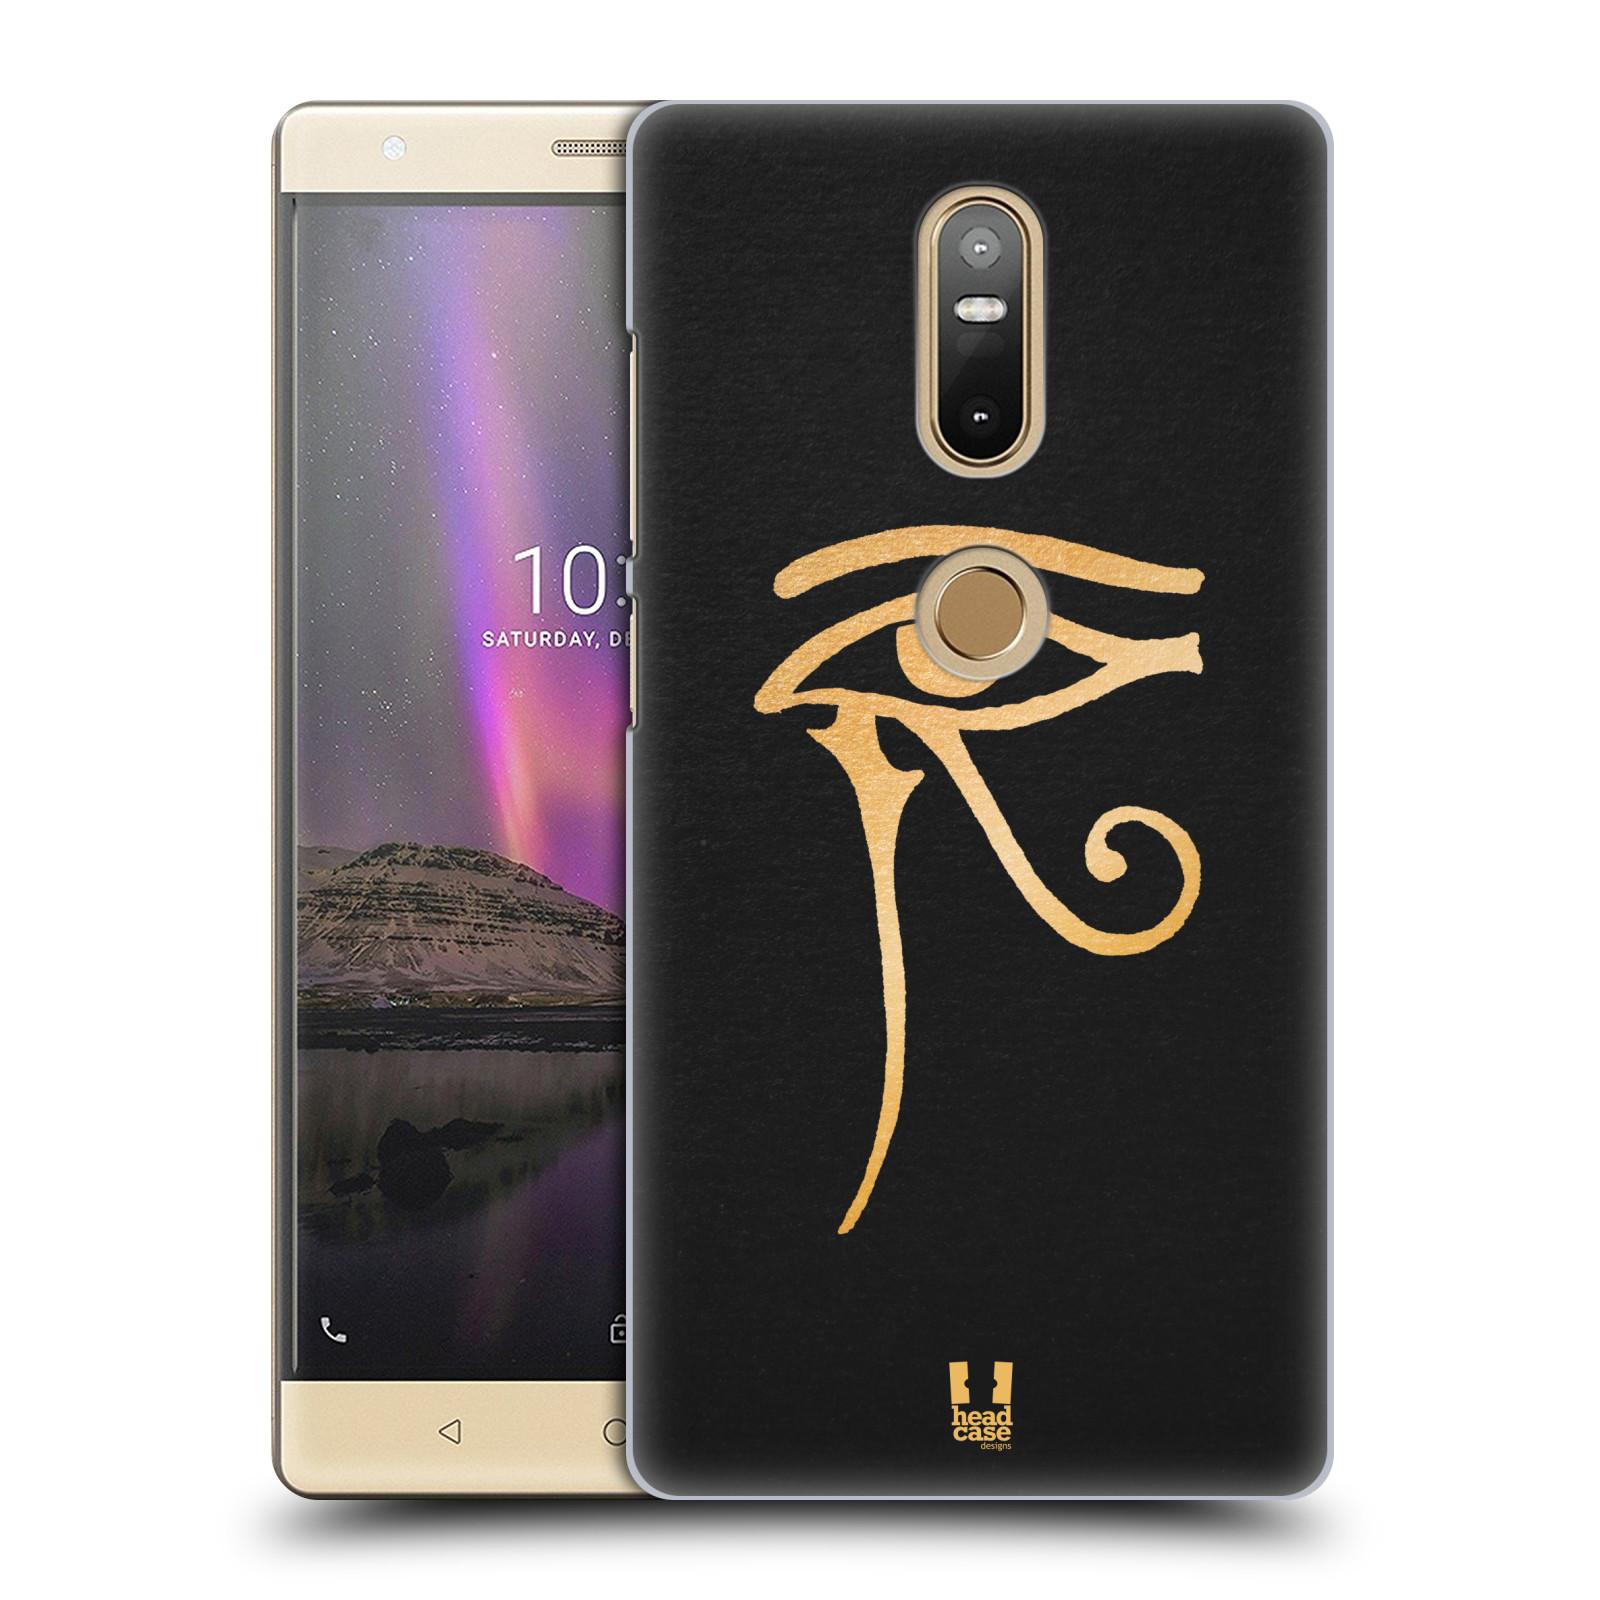 Plastové pouzdro na mobil Lenovo Phab 2 Plus - Head Case - EGYPT OKO BOHA RA (Plastový kryt či obal na mobilní telefon Lenovo Phab 2 Plus Dual SIM s motivem EGYPT OKO BOHA RA)